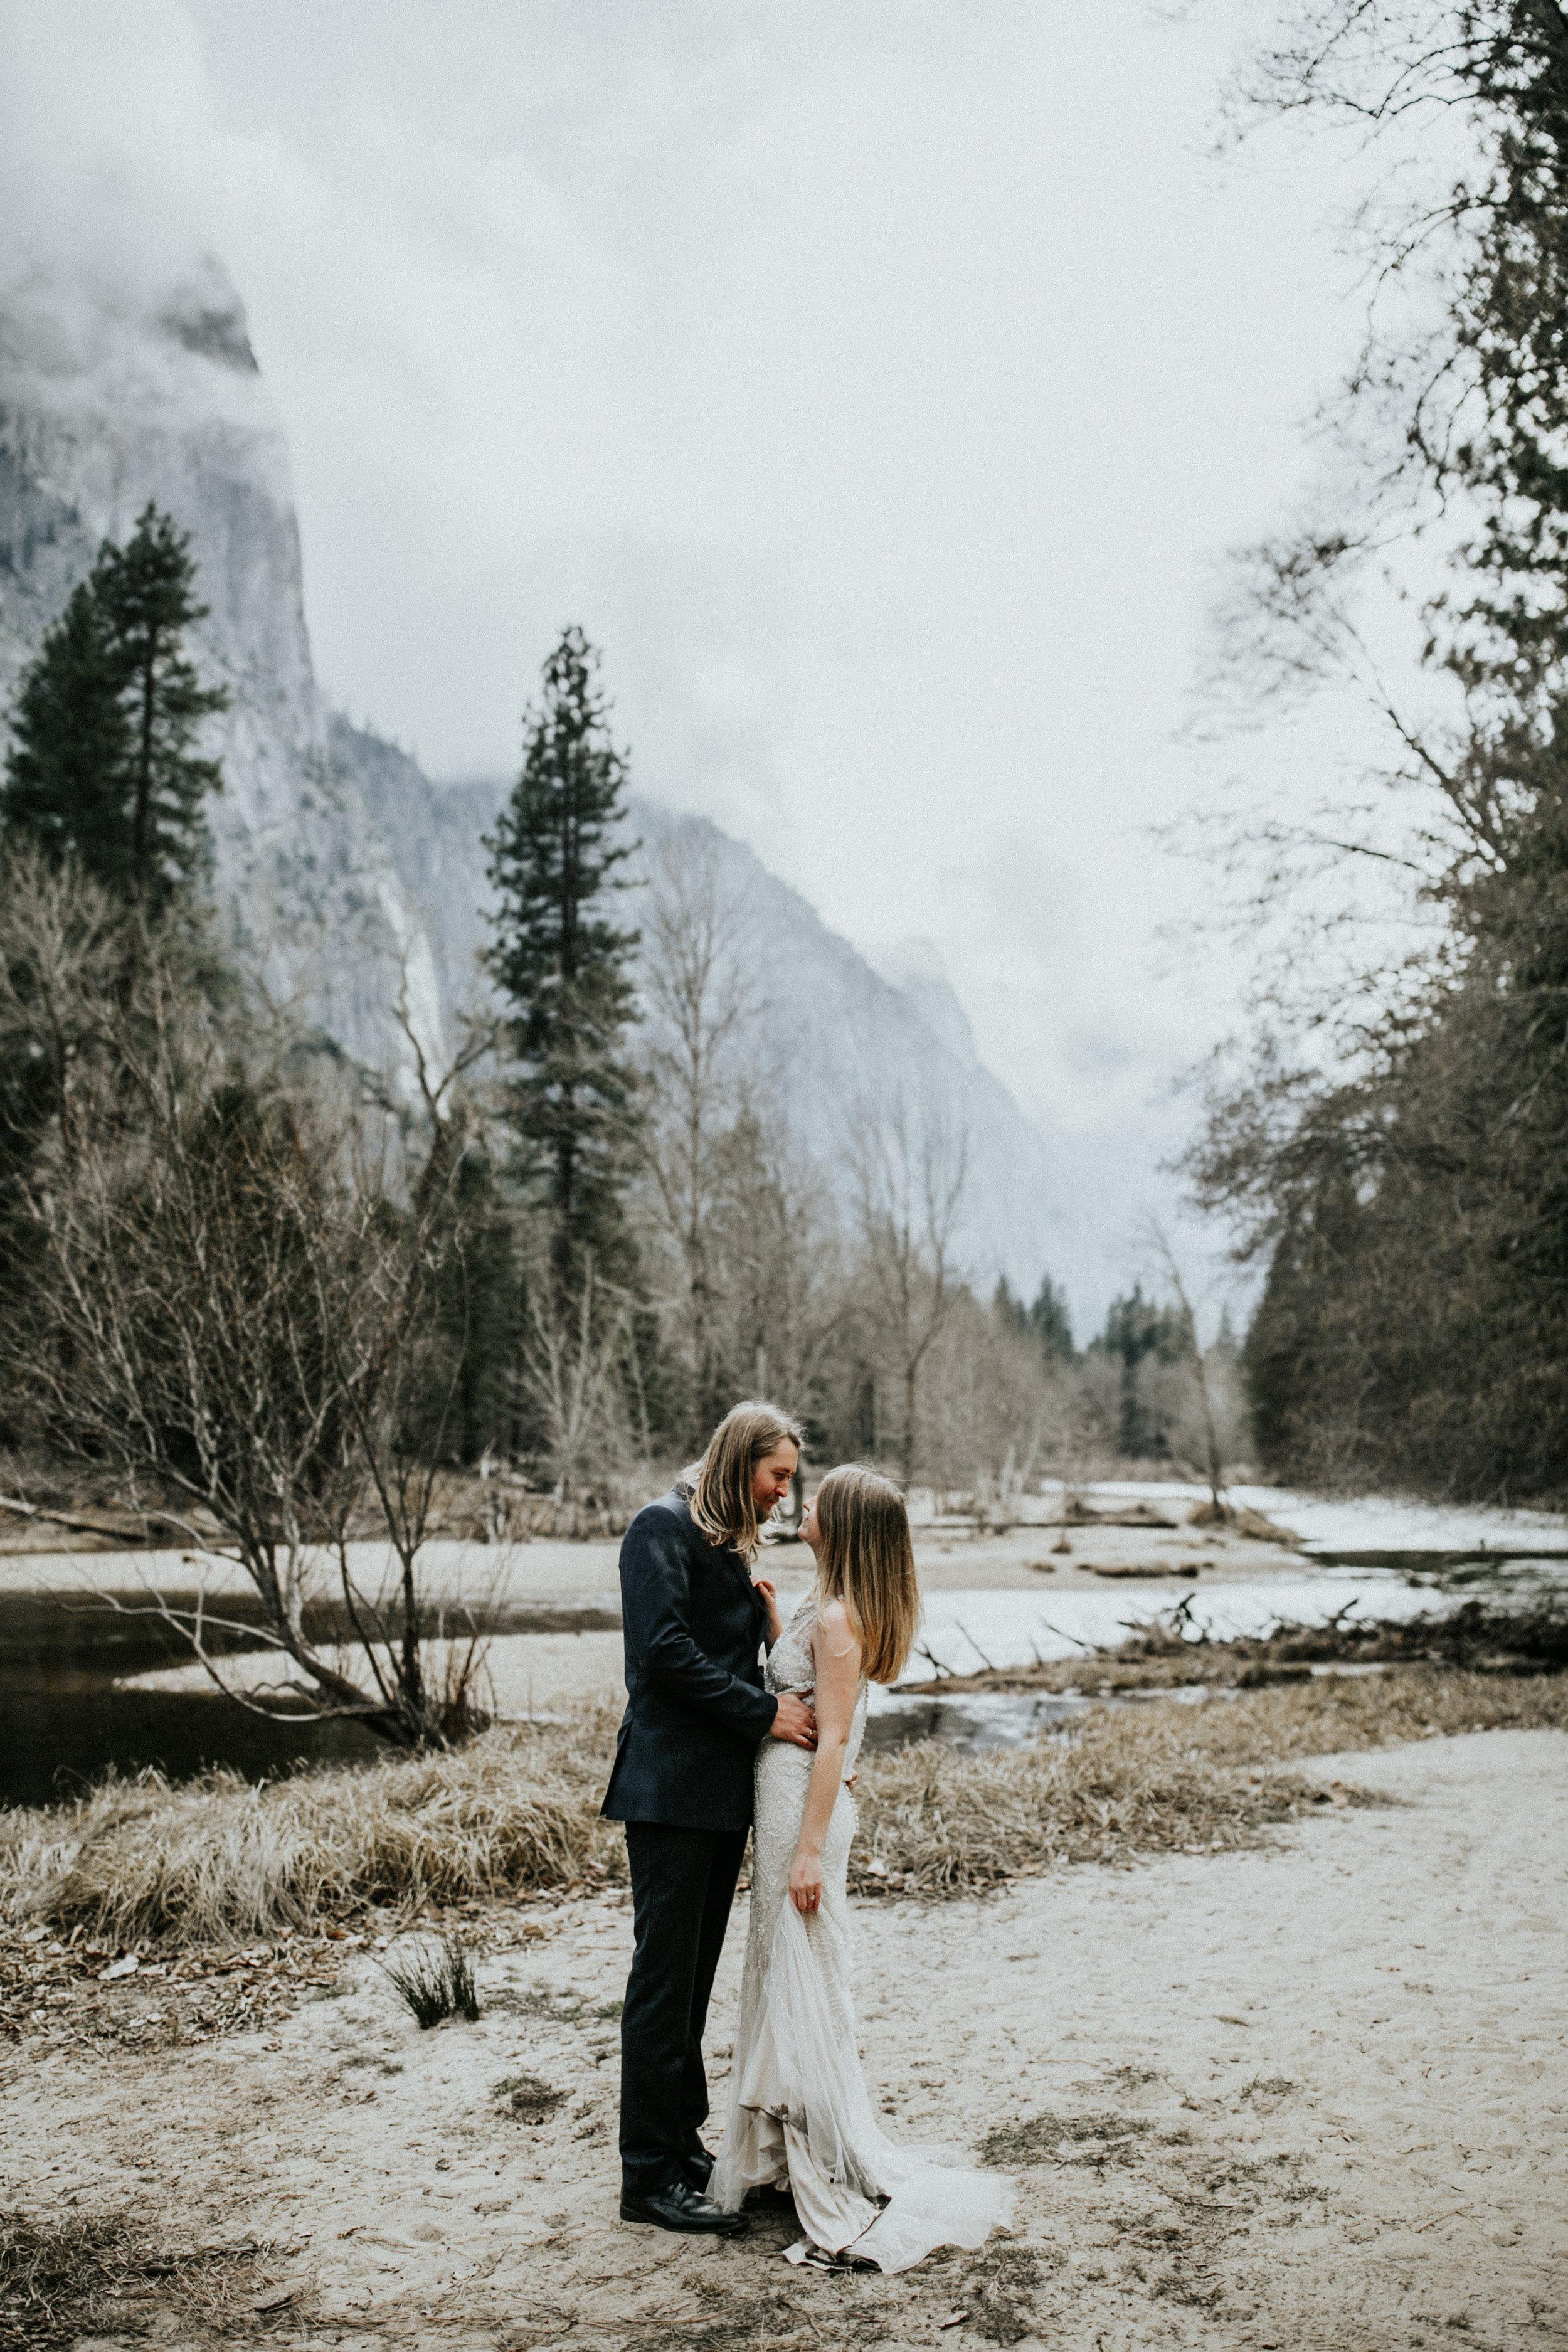 adventure-california-yosemite-photographer-grace-t-photography-59.jpg